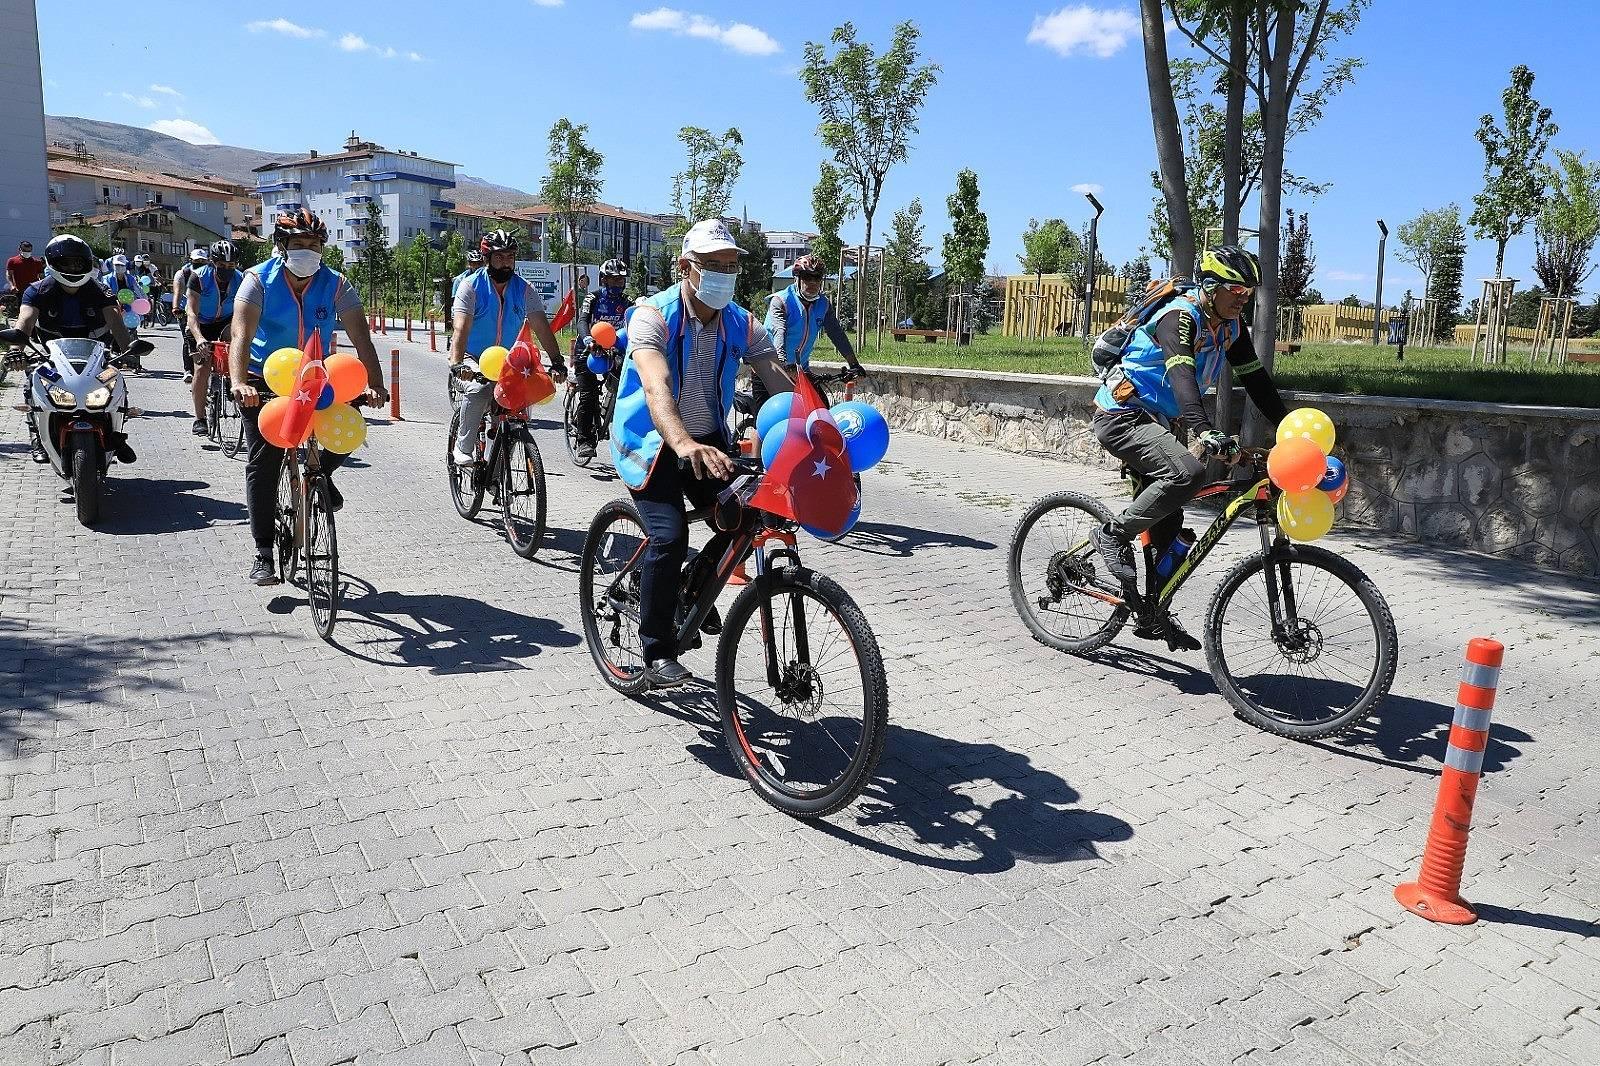 2021/06/battalgazi-belediyesinden-ozel-bisiklet-turu-etkinligi-20210606AW33-4.jpg